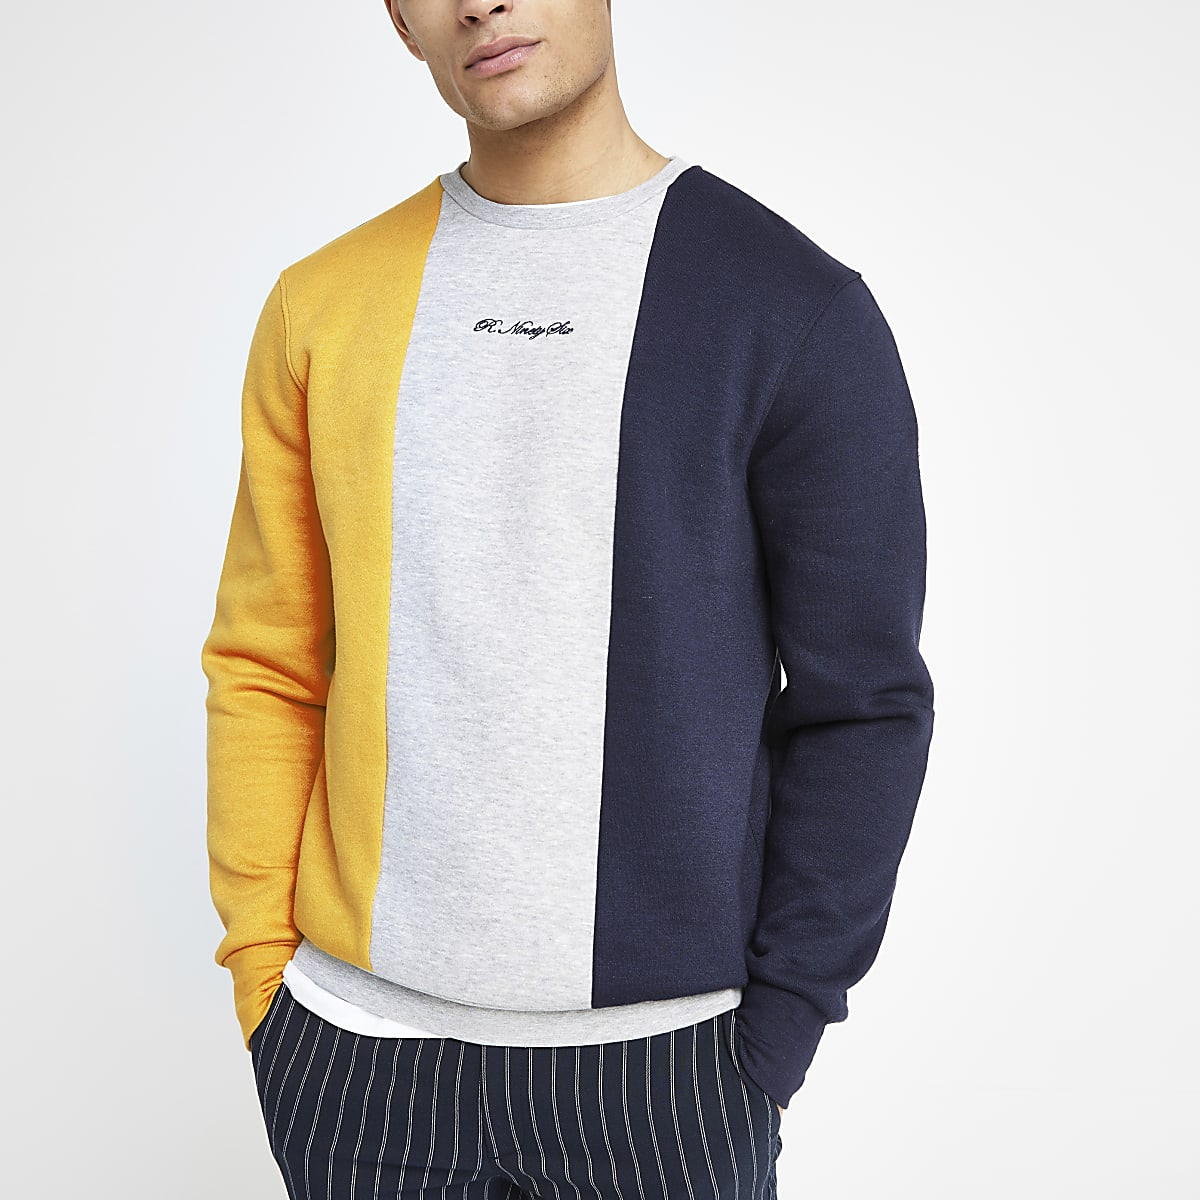 R96 yellow block slim fit sweatshirt